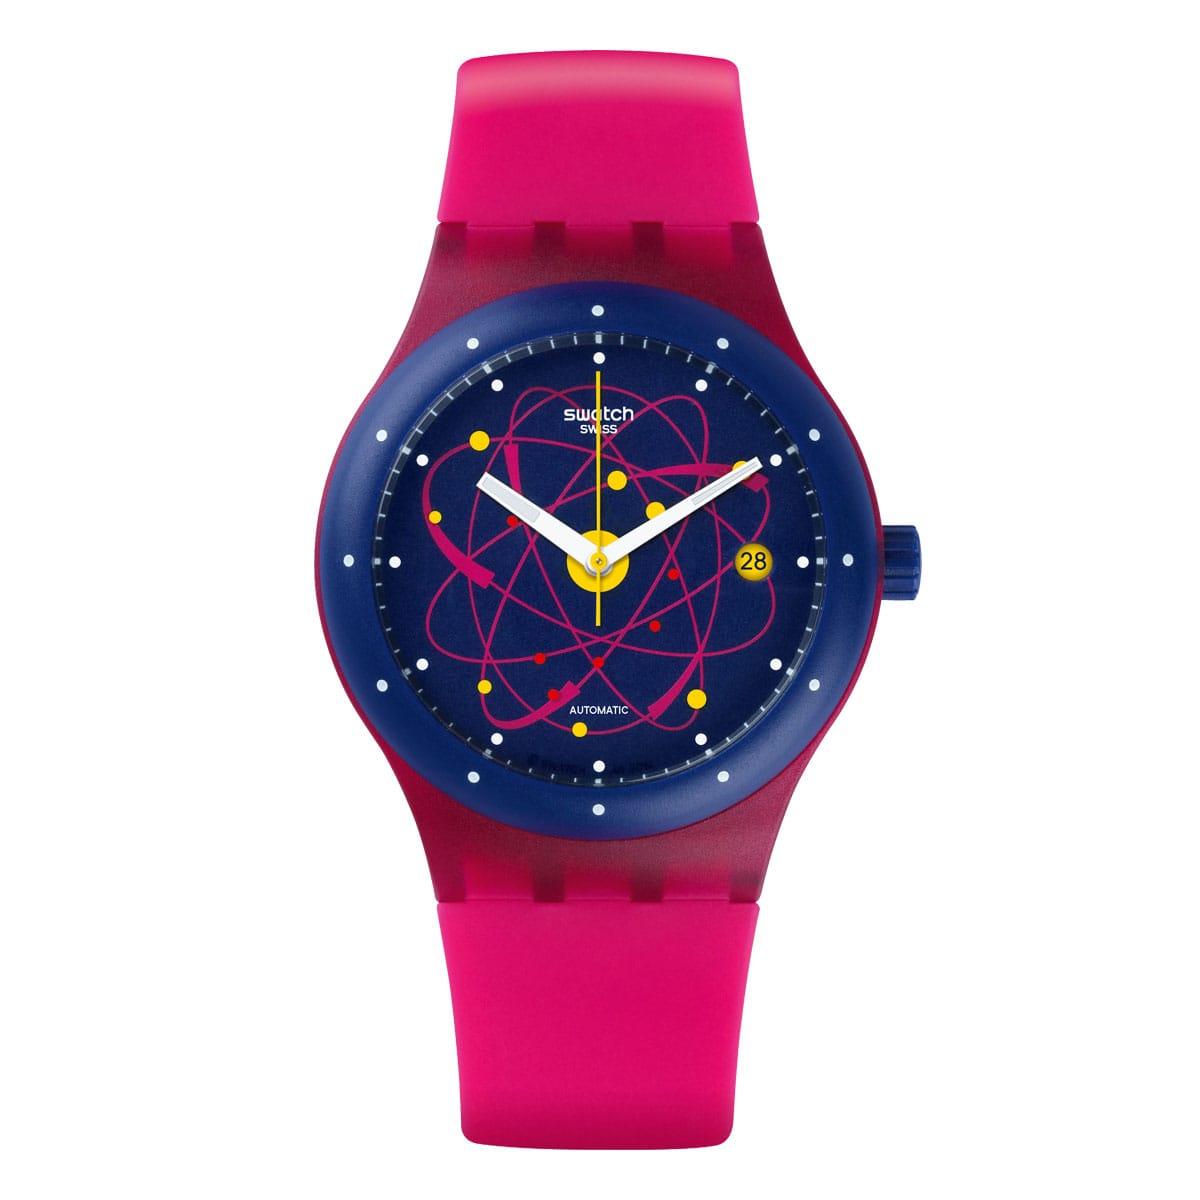 Swatch-Sistem-51-Pink-SUTR401 Lionel Meylan Horlogerie Joaillerie Vevey